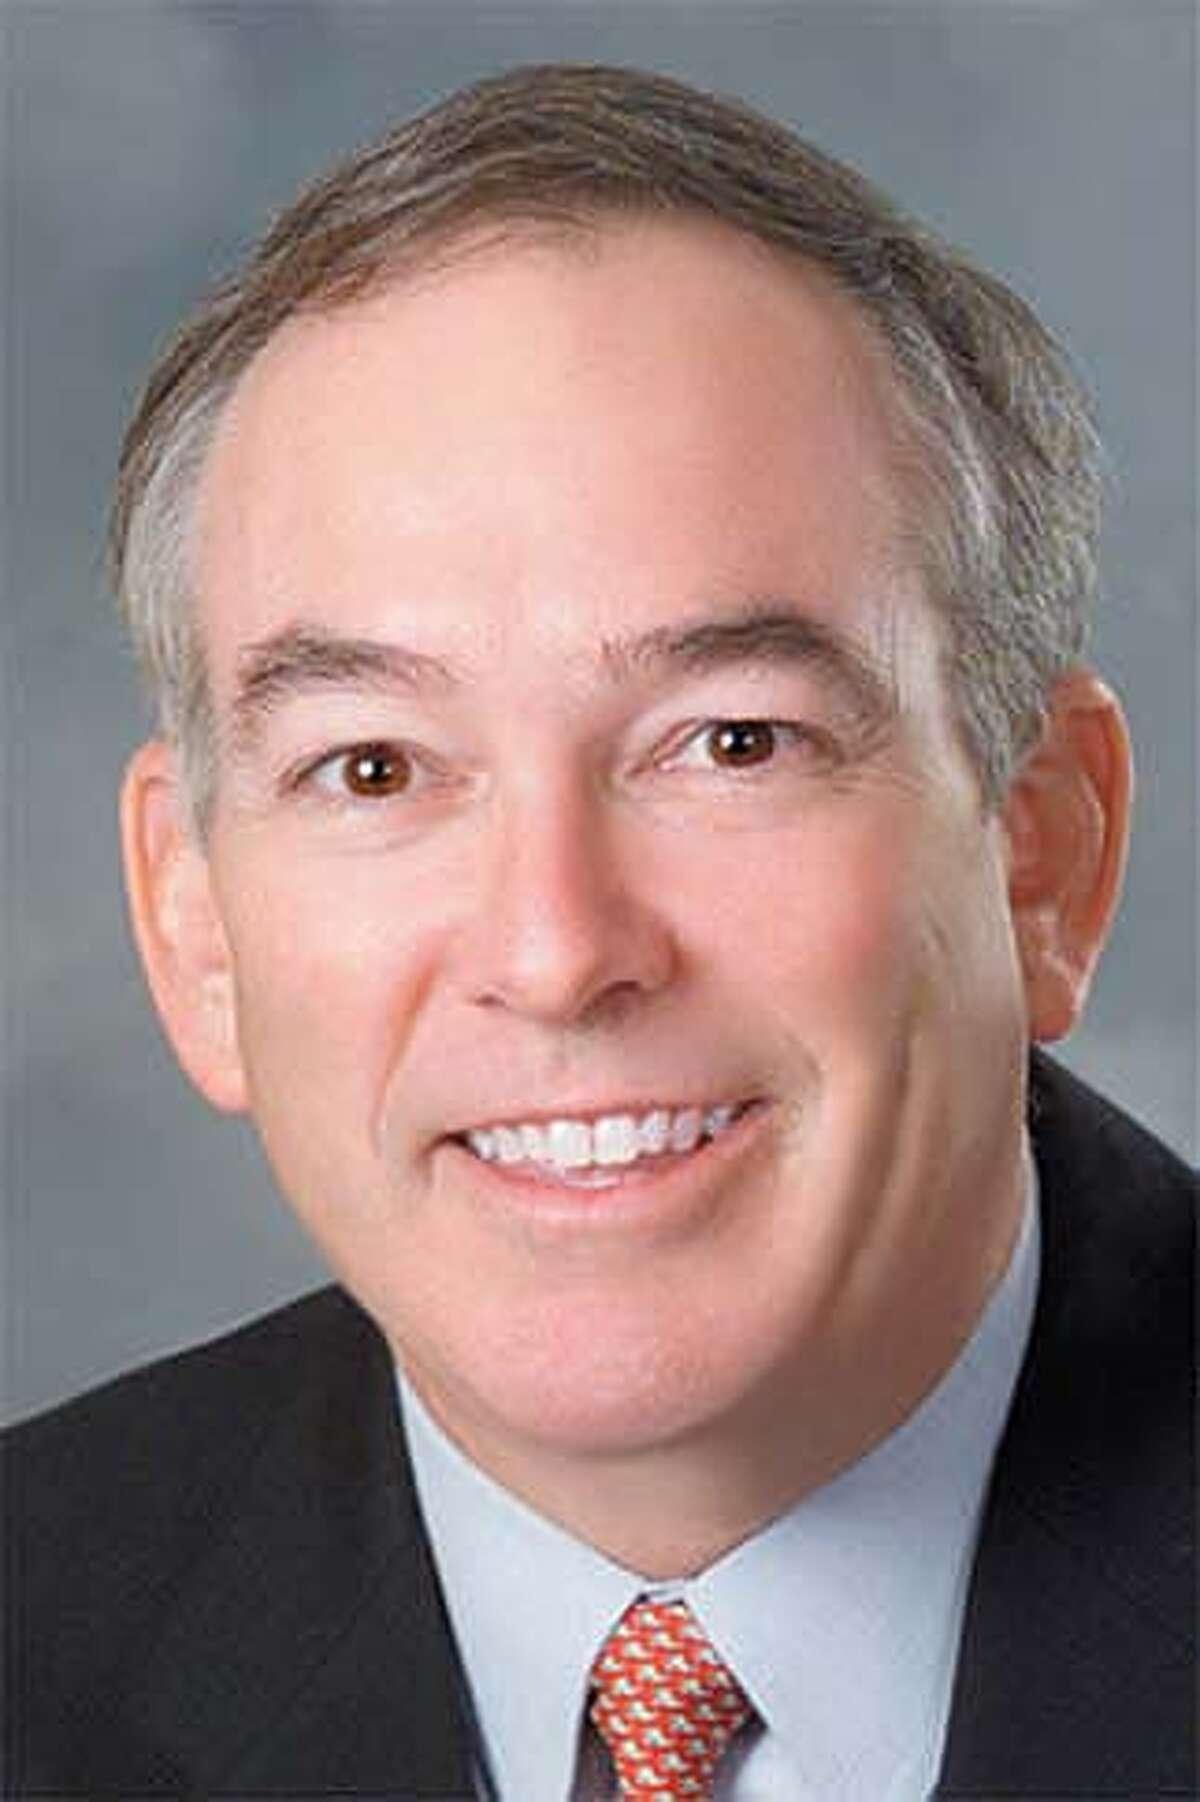 Tramm Hudson, 53, Sarasota banker candidate for Florida Congressional District 13. Handout Photo